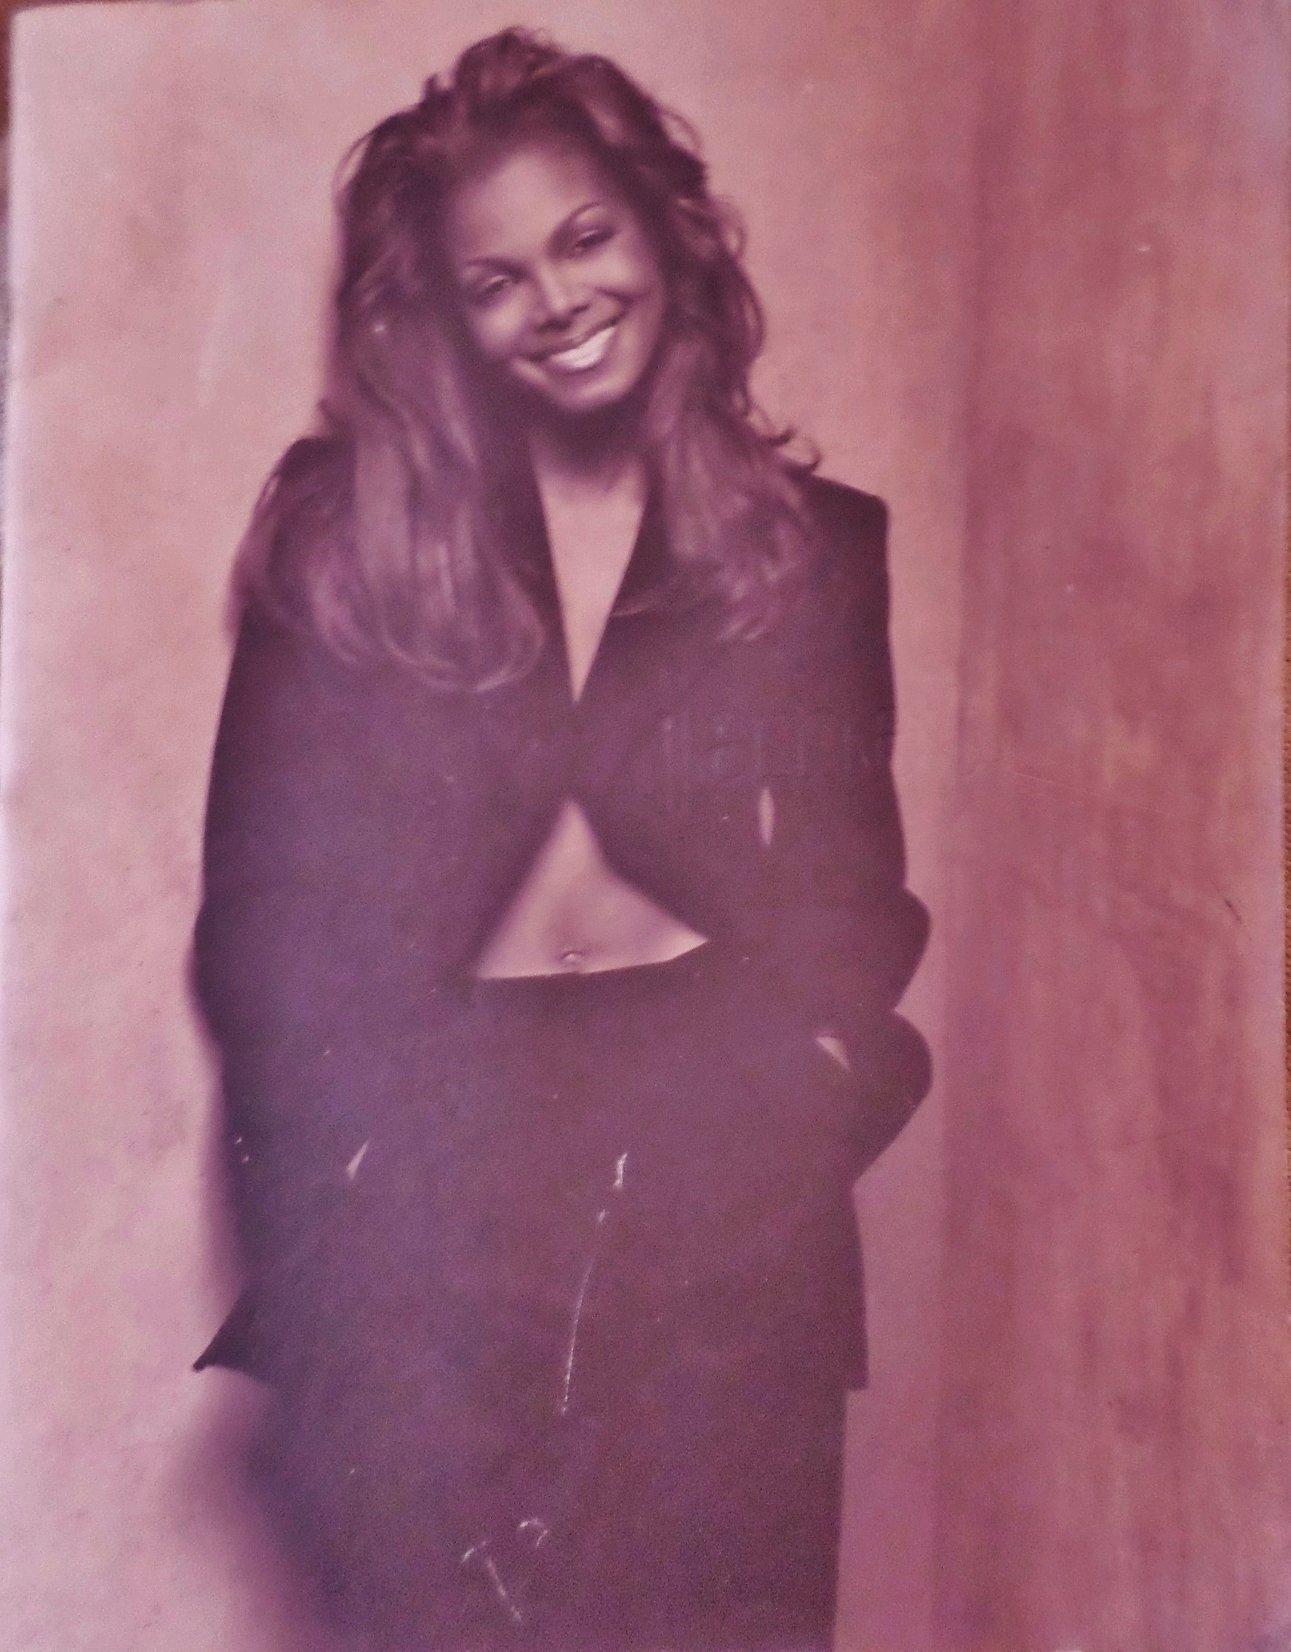 JANET - World Tour (jdj, Music Television presents Janet